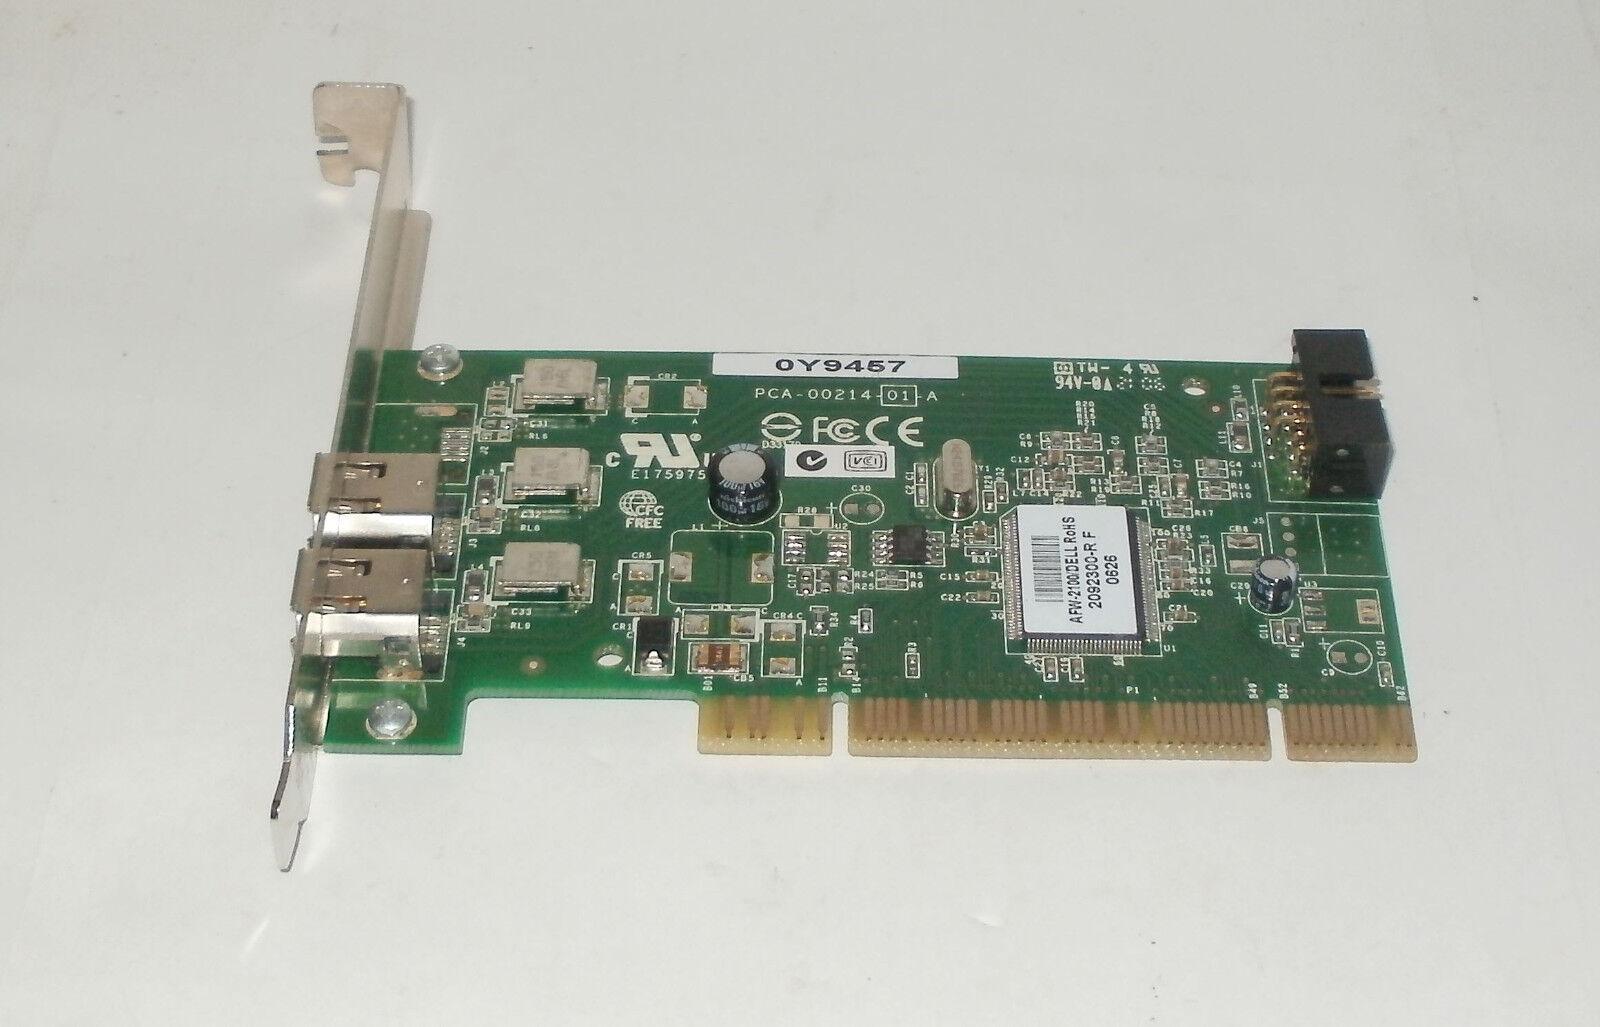 OEM Dell Y9457 Dual Port Adaptec AFW-2100 PCI FireWire PCI Card IEEE-1394 0Y9457